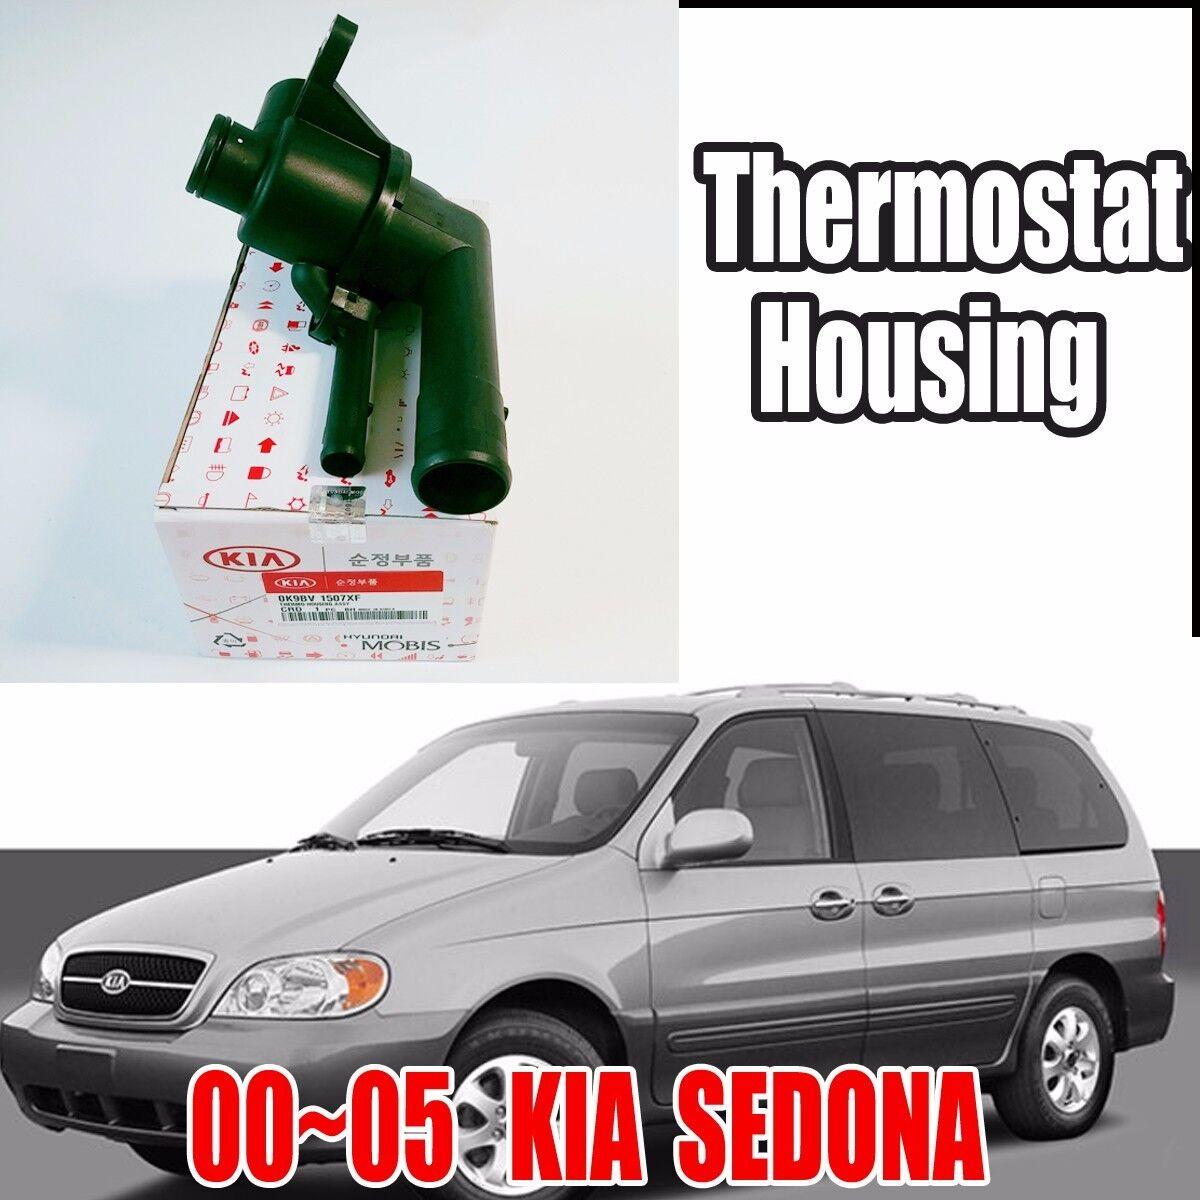 Thermostats Parts Ebayshopkorea Discover Korea On Ebay Kia Optima 2004 Thermostat Location 2000 2005 Sedona Engine Coolant Housing Genuine 0k9bv 1507xf